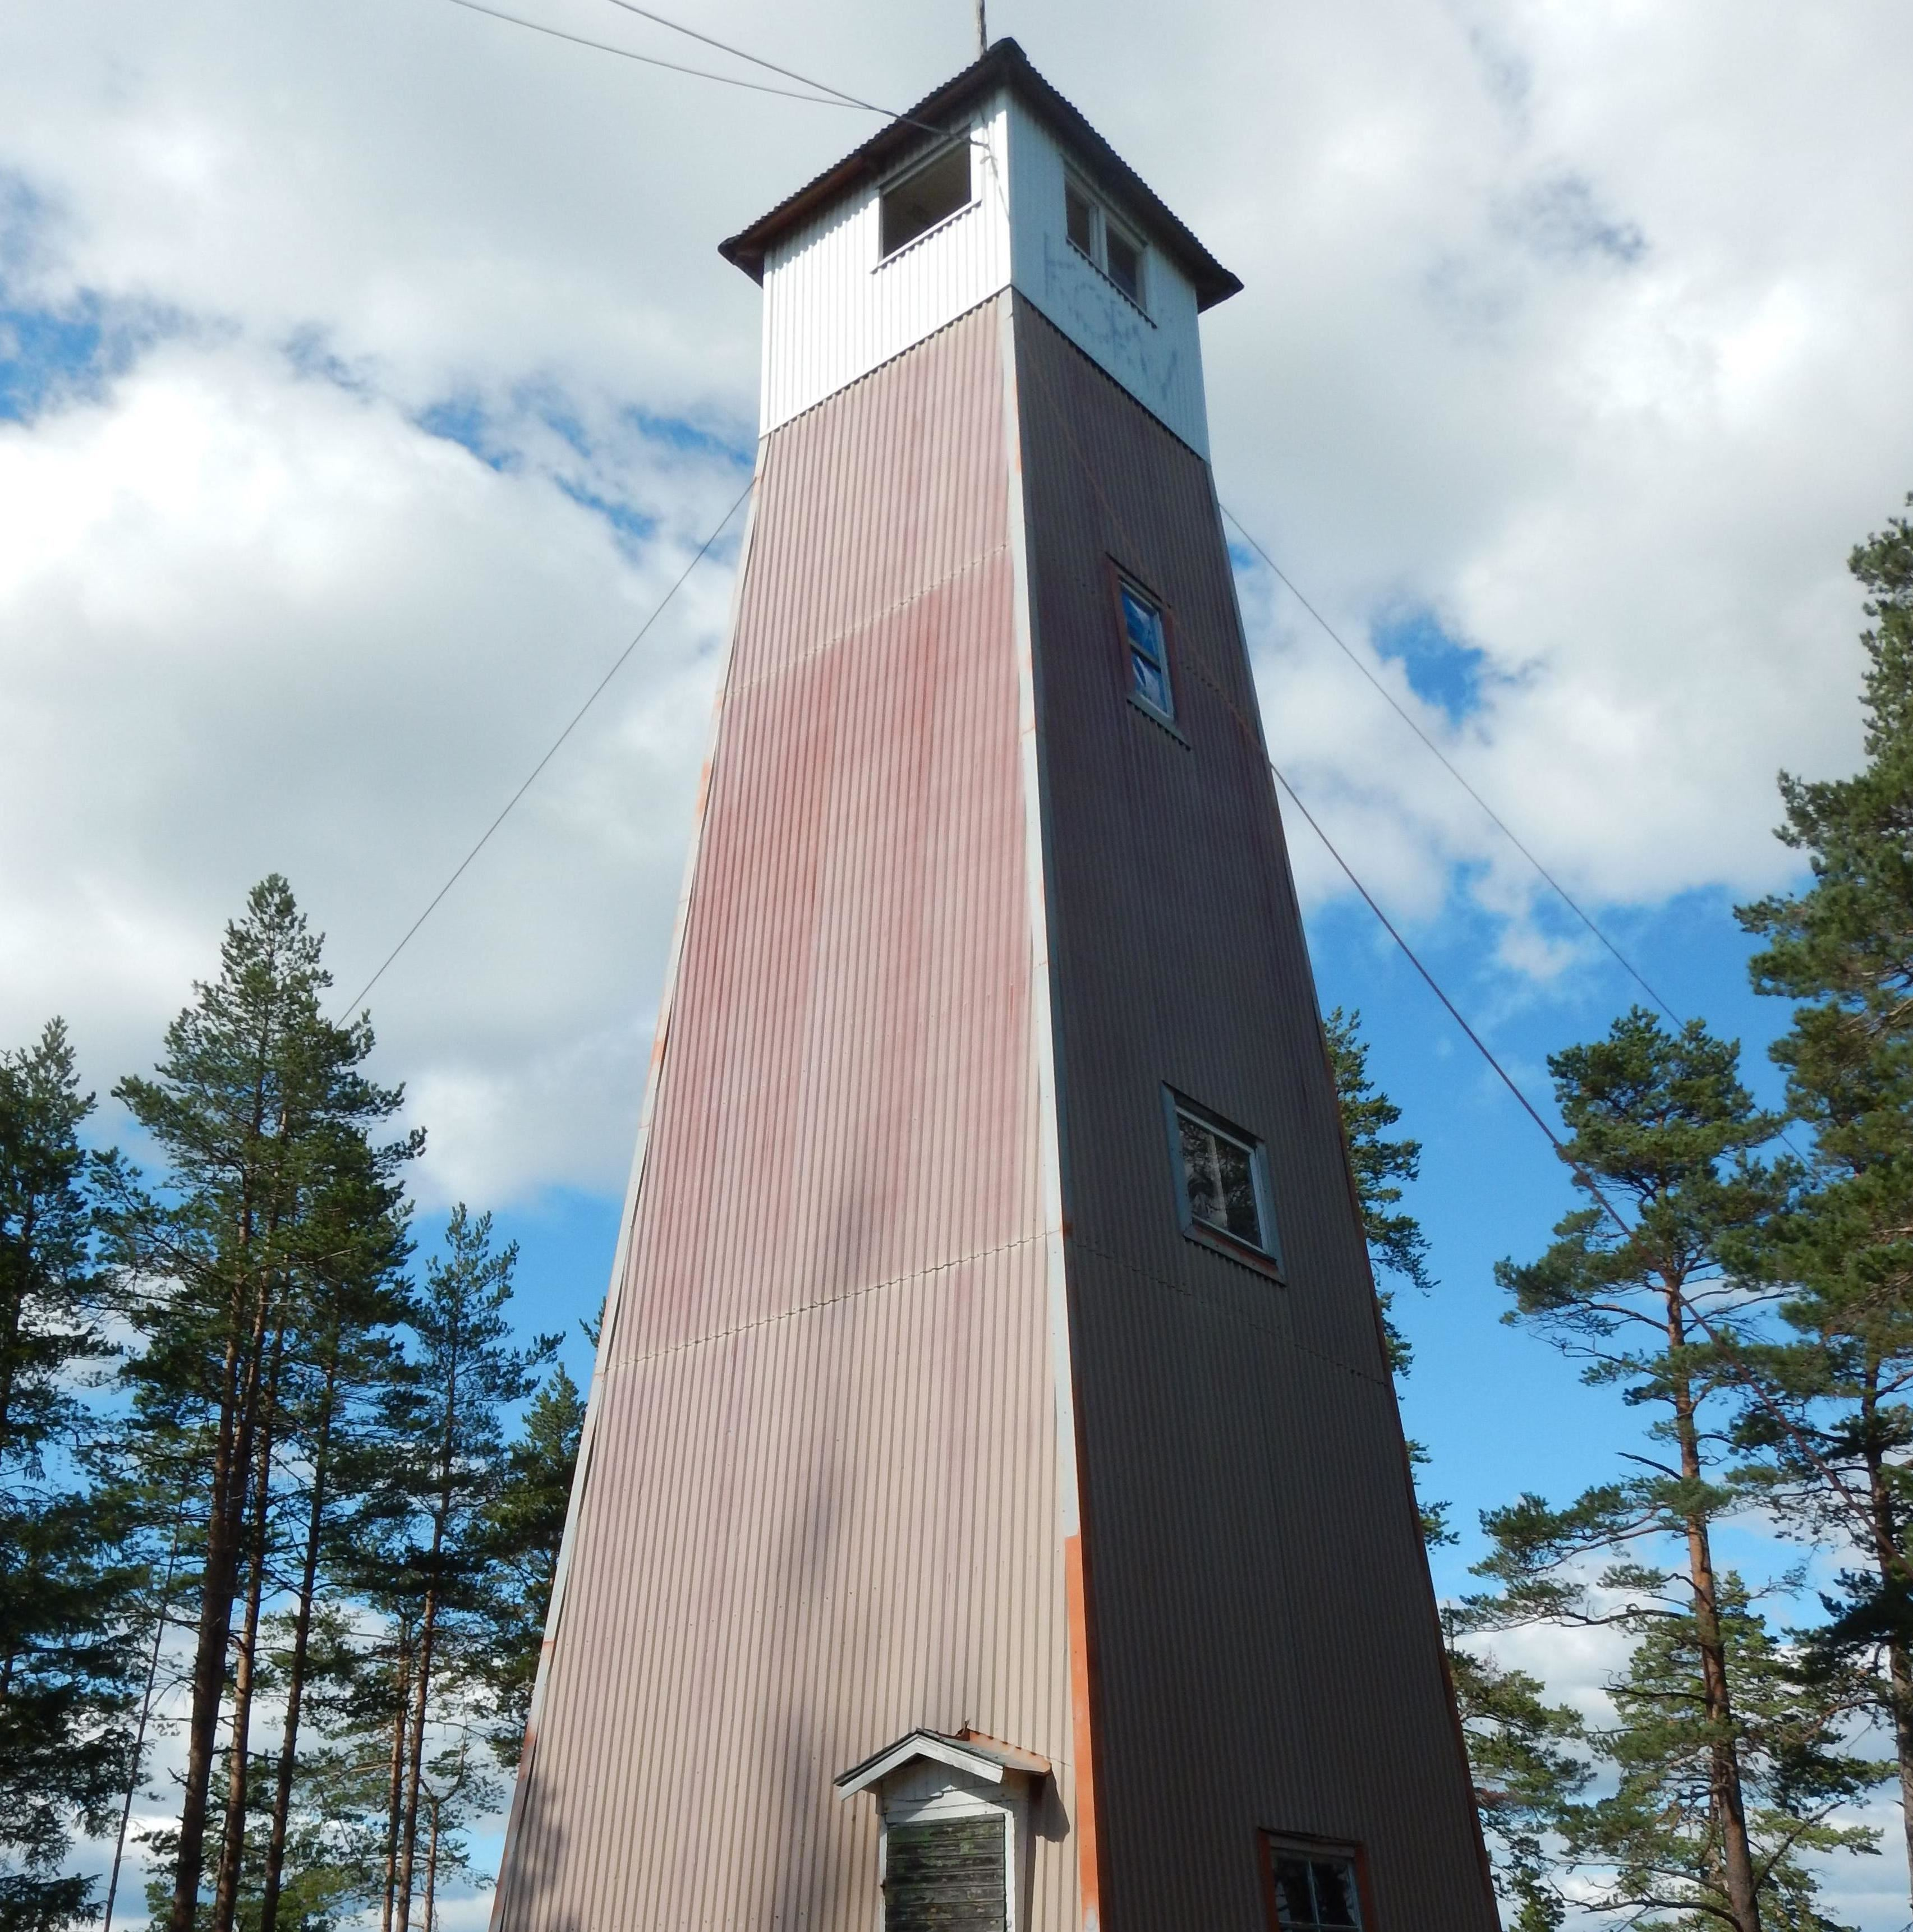 Bengt Norling, Rösåsens tower